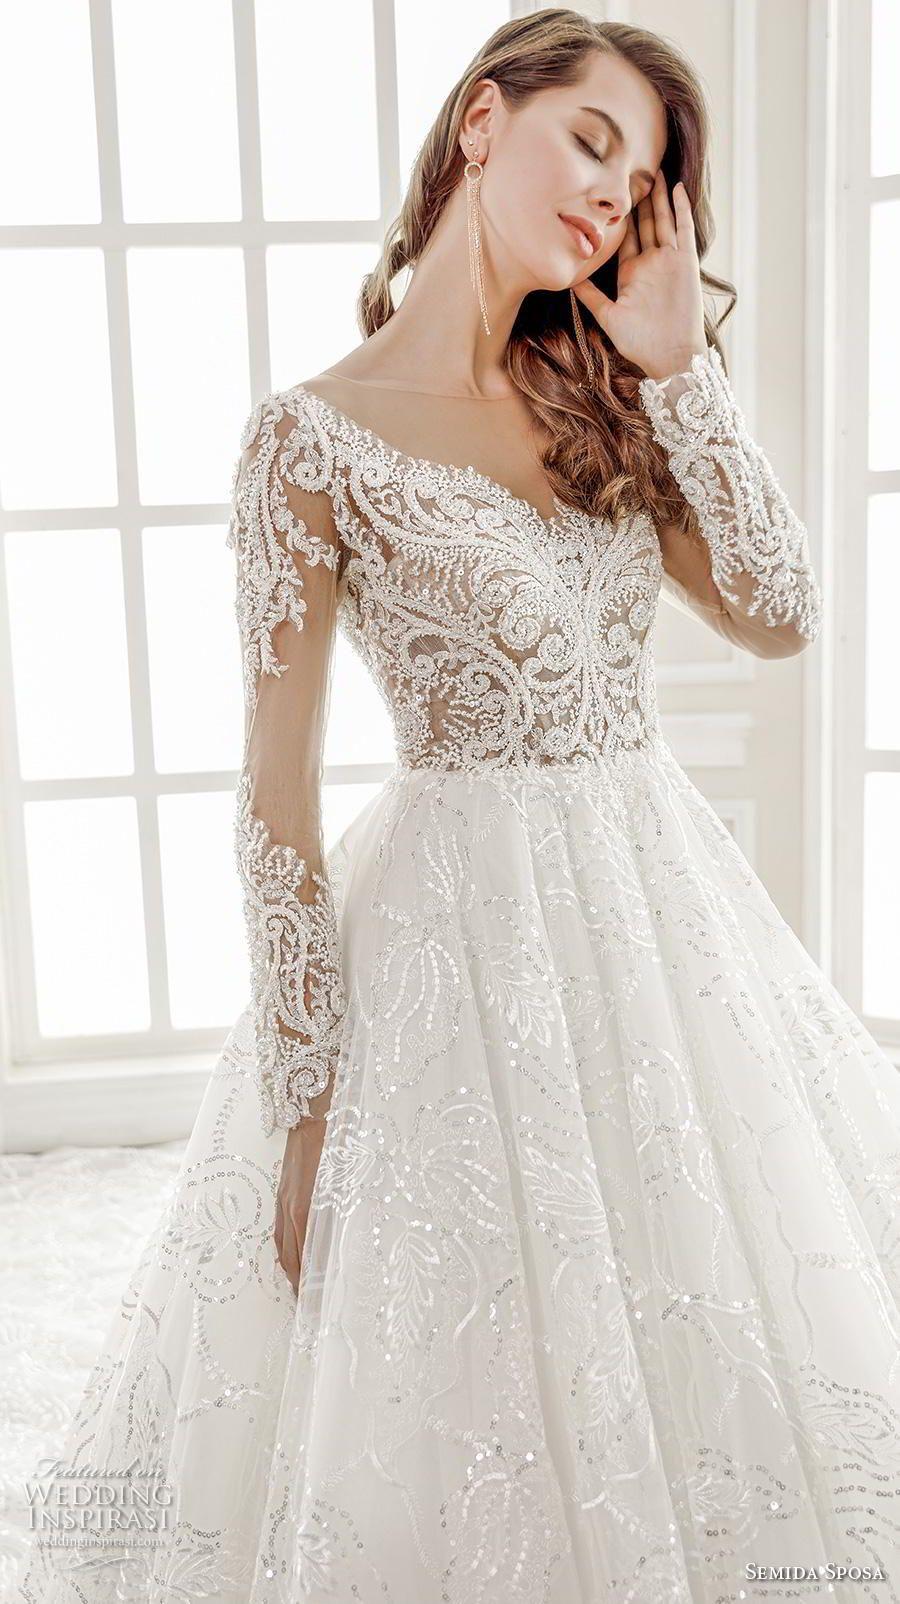 Shop These Top Rated Amazon Wedding Dresses Under 100 Wedding Dresses Amazon Wedding Dresses Under 100 Budget Wedding Dress